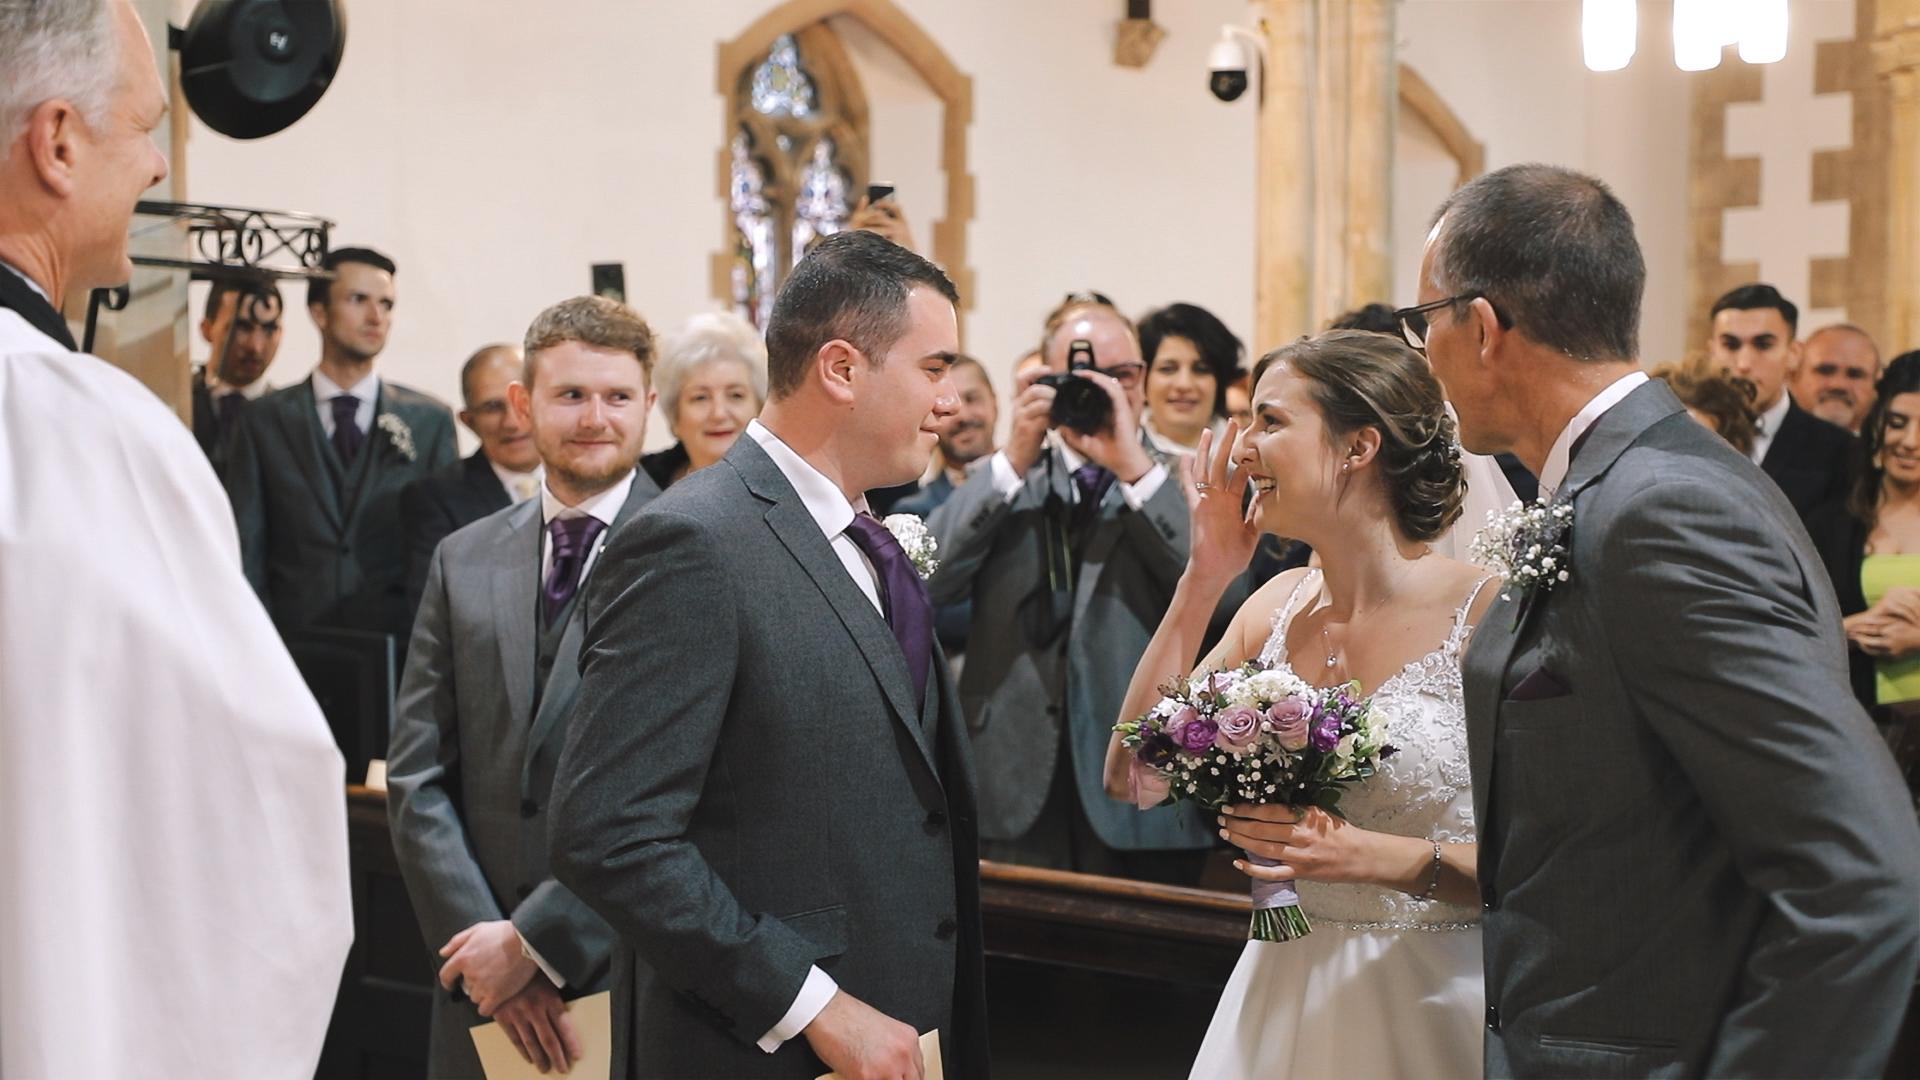 wedding ceremony at Plymouth Emmanuel church